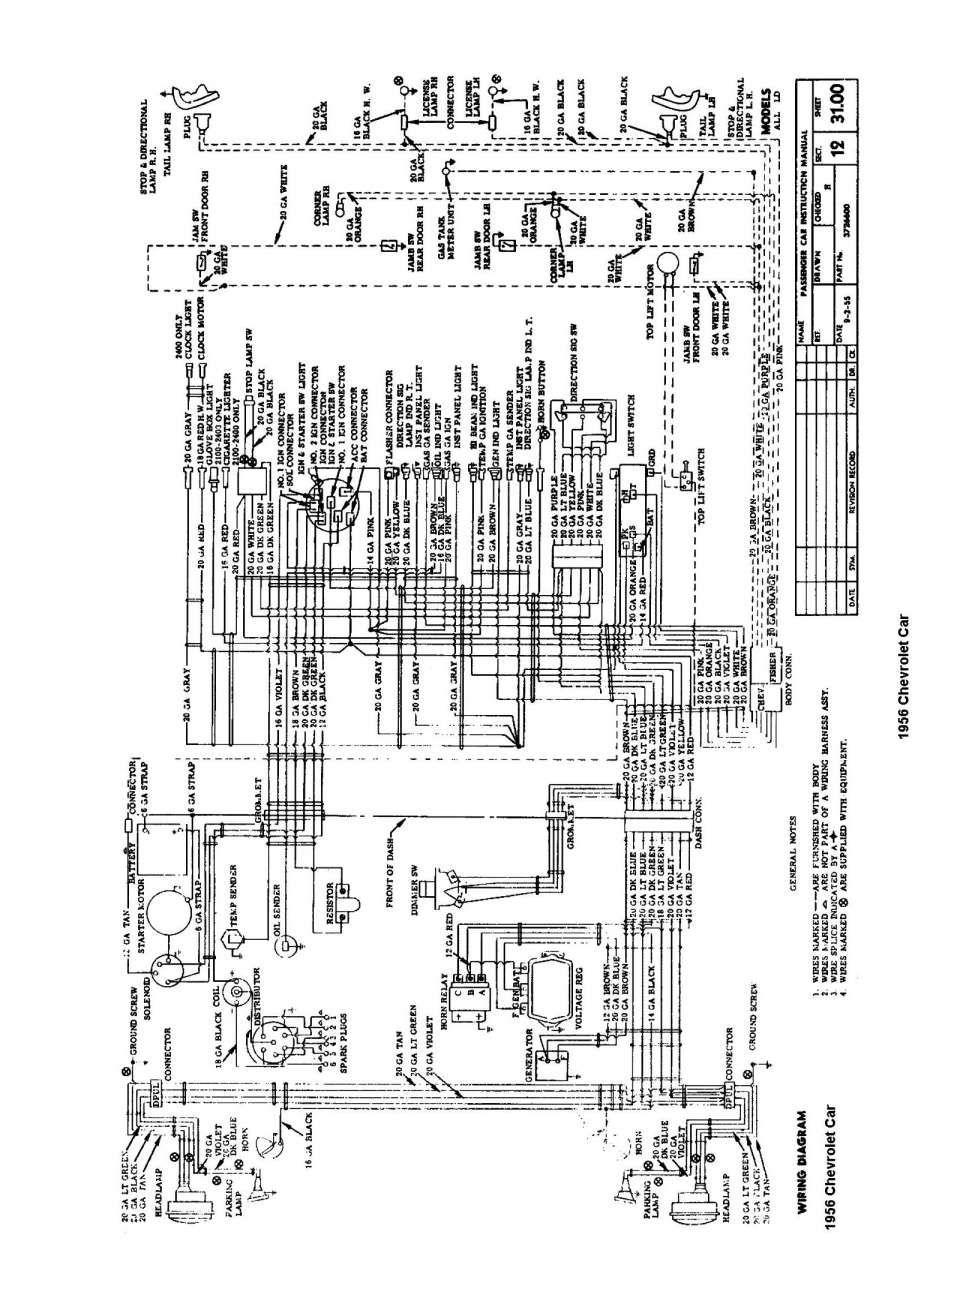 16 1956 International Truck Wiring Diagram Truck Diagram In